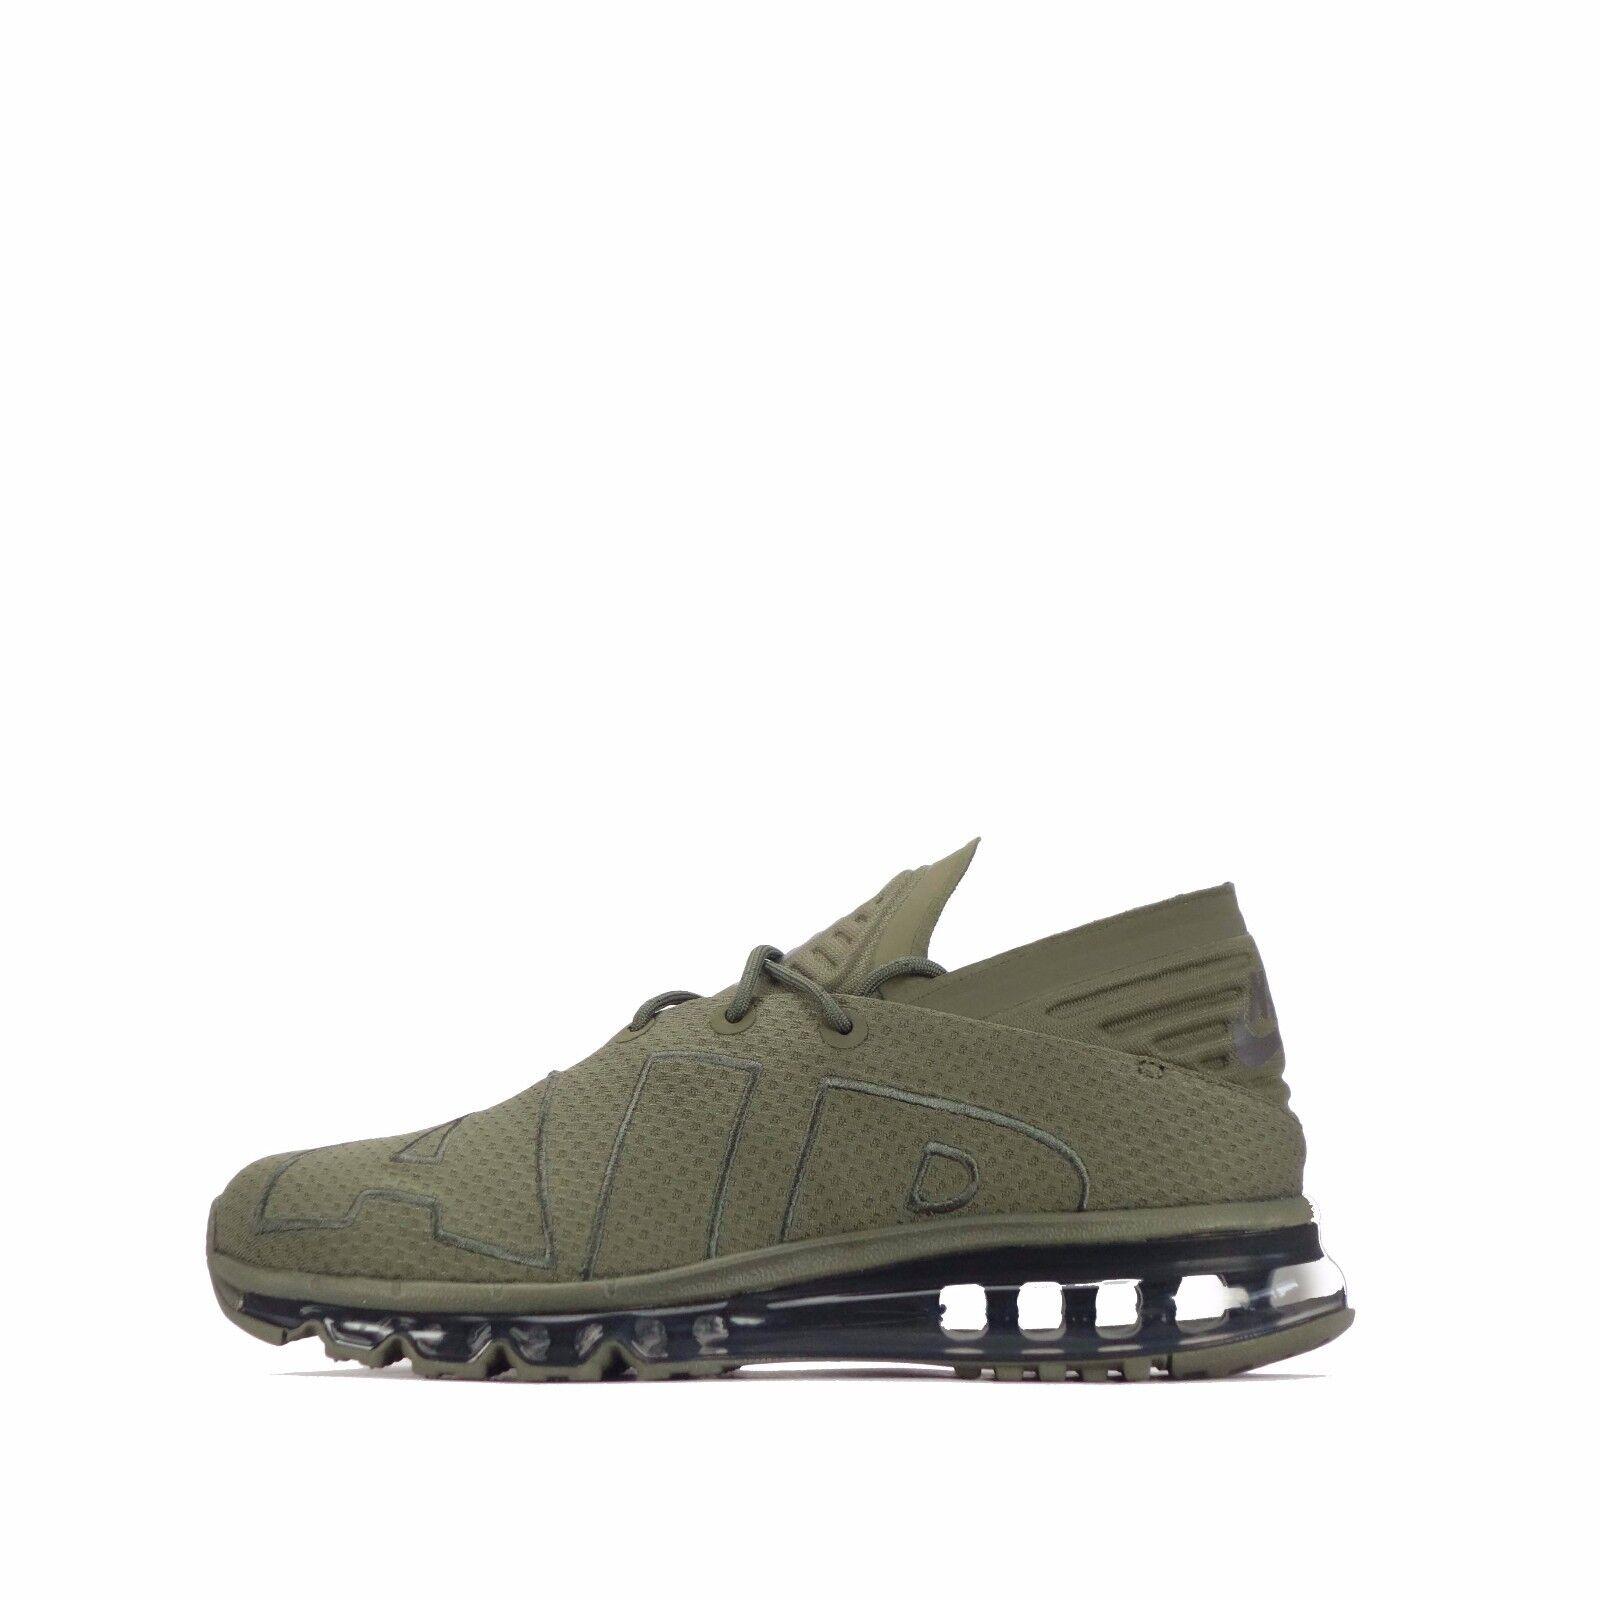 Nike Luft Max Flair Herren Schuhe Medium Oliv